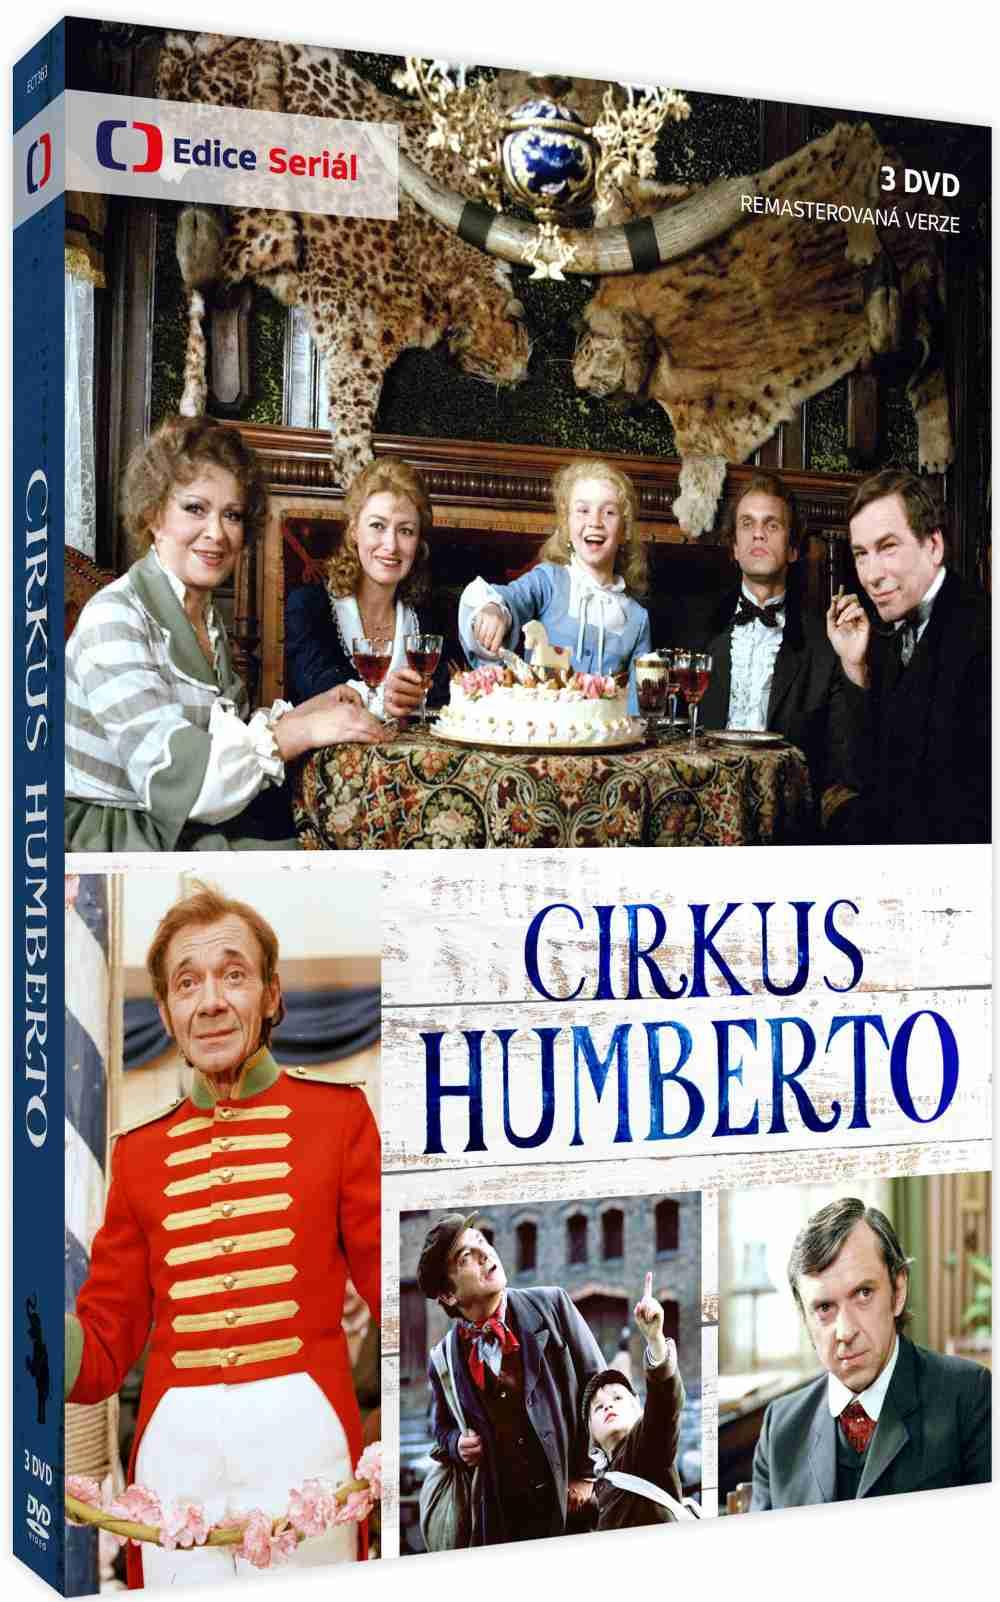 Cirkus Humberto (remasterovaná verze) - 3DVD